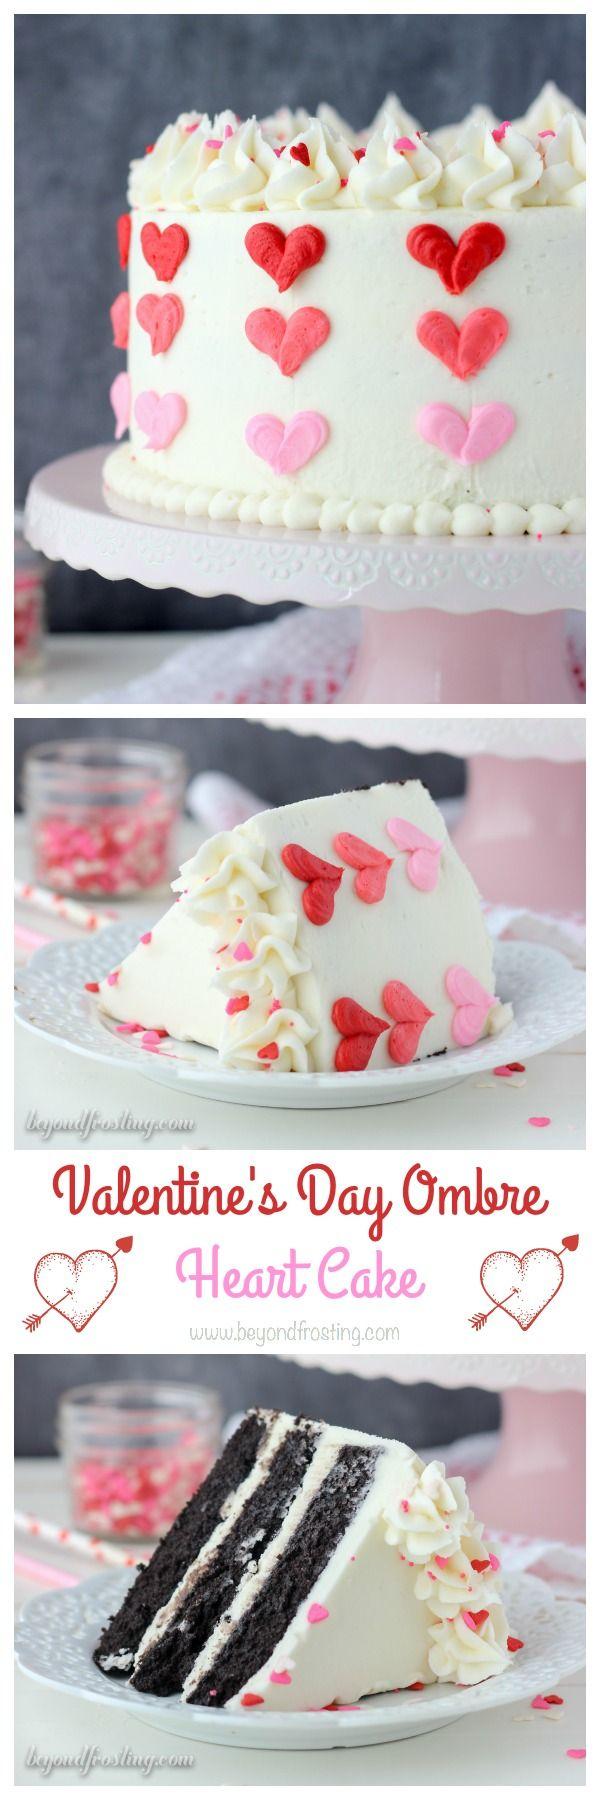 best 25+ valentine cake ideas on pinterest   heart cakes